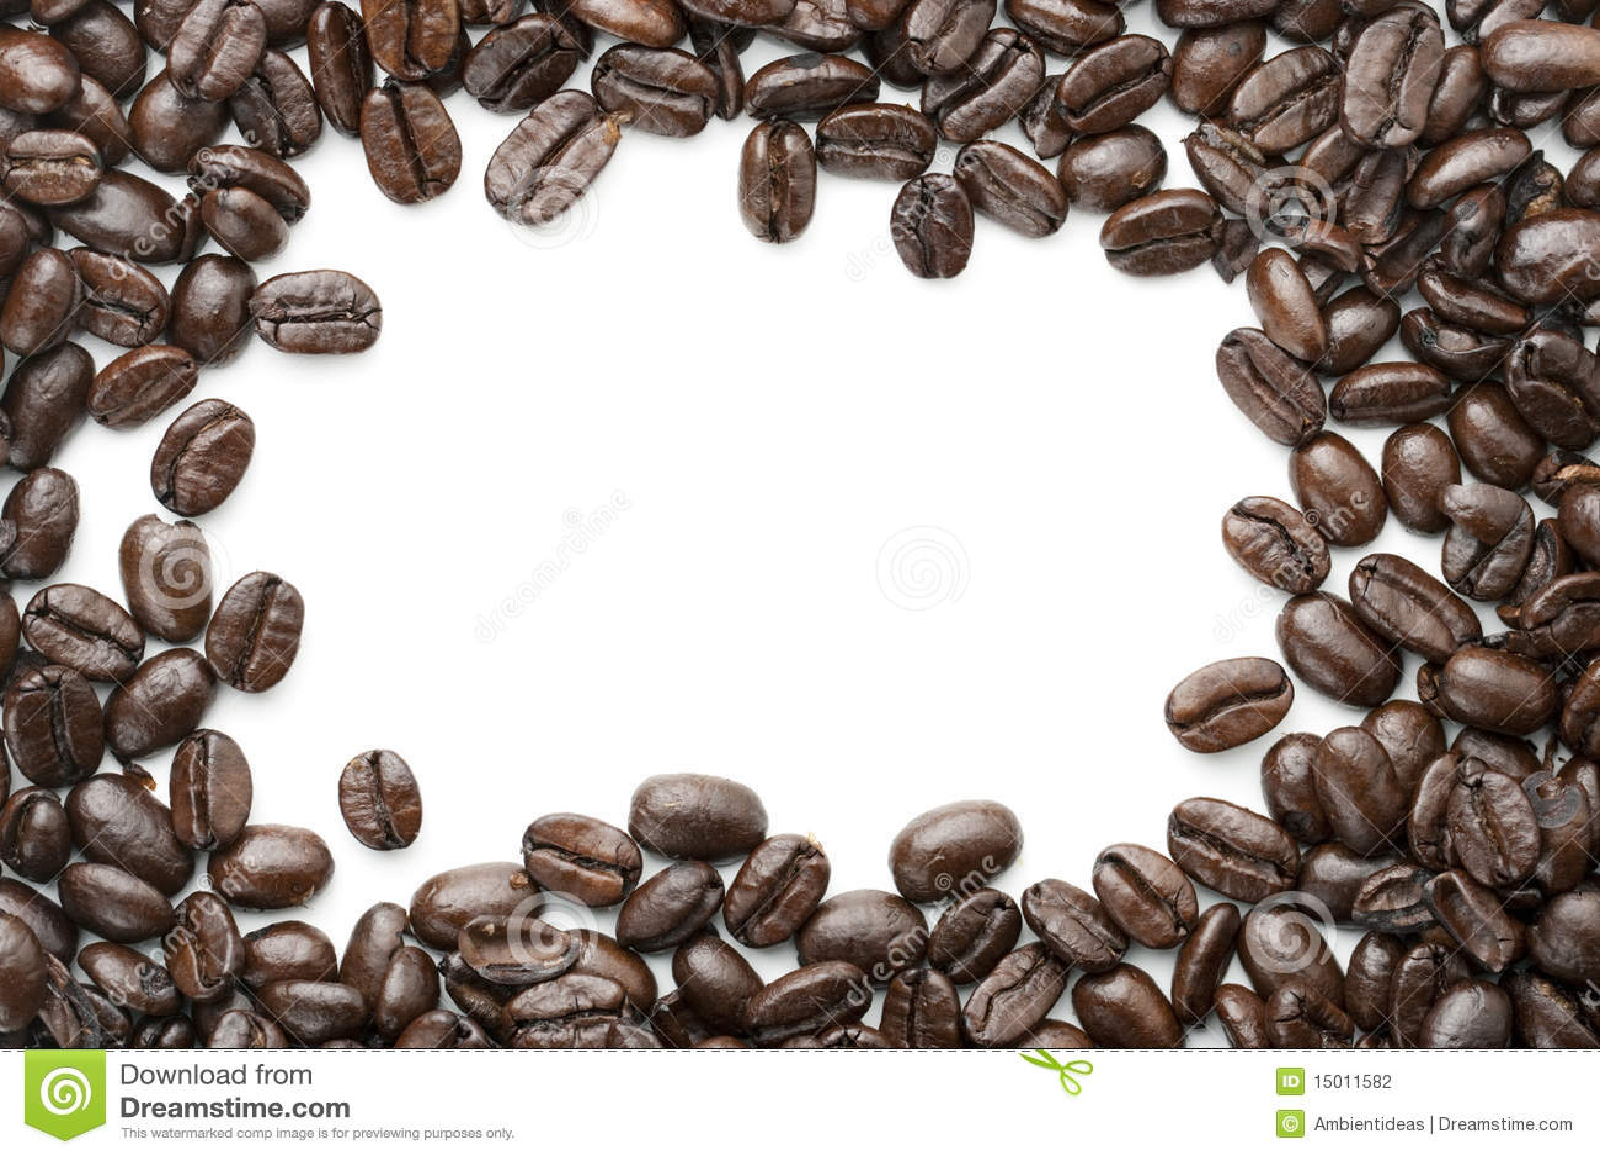 Coffee Bean Border ~ Coffee beans border isolated on white stock photo image